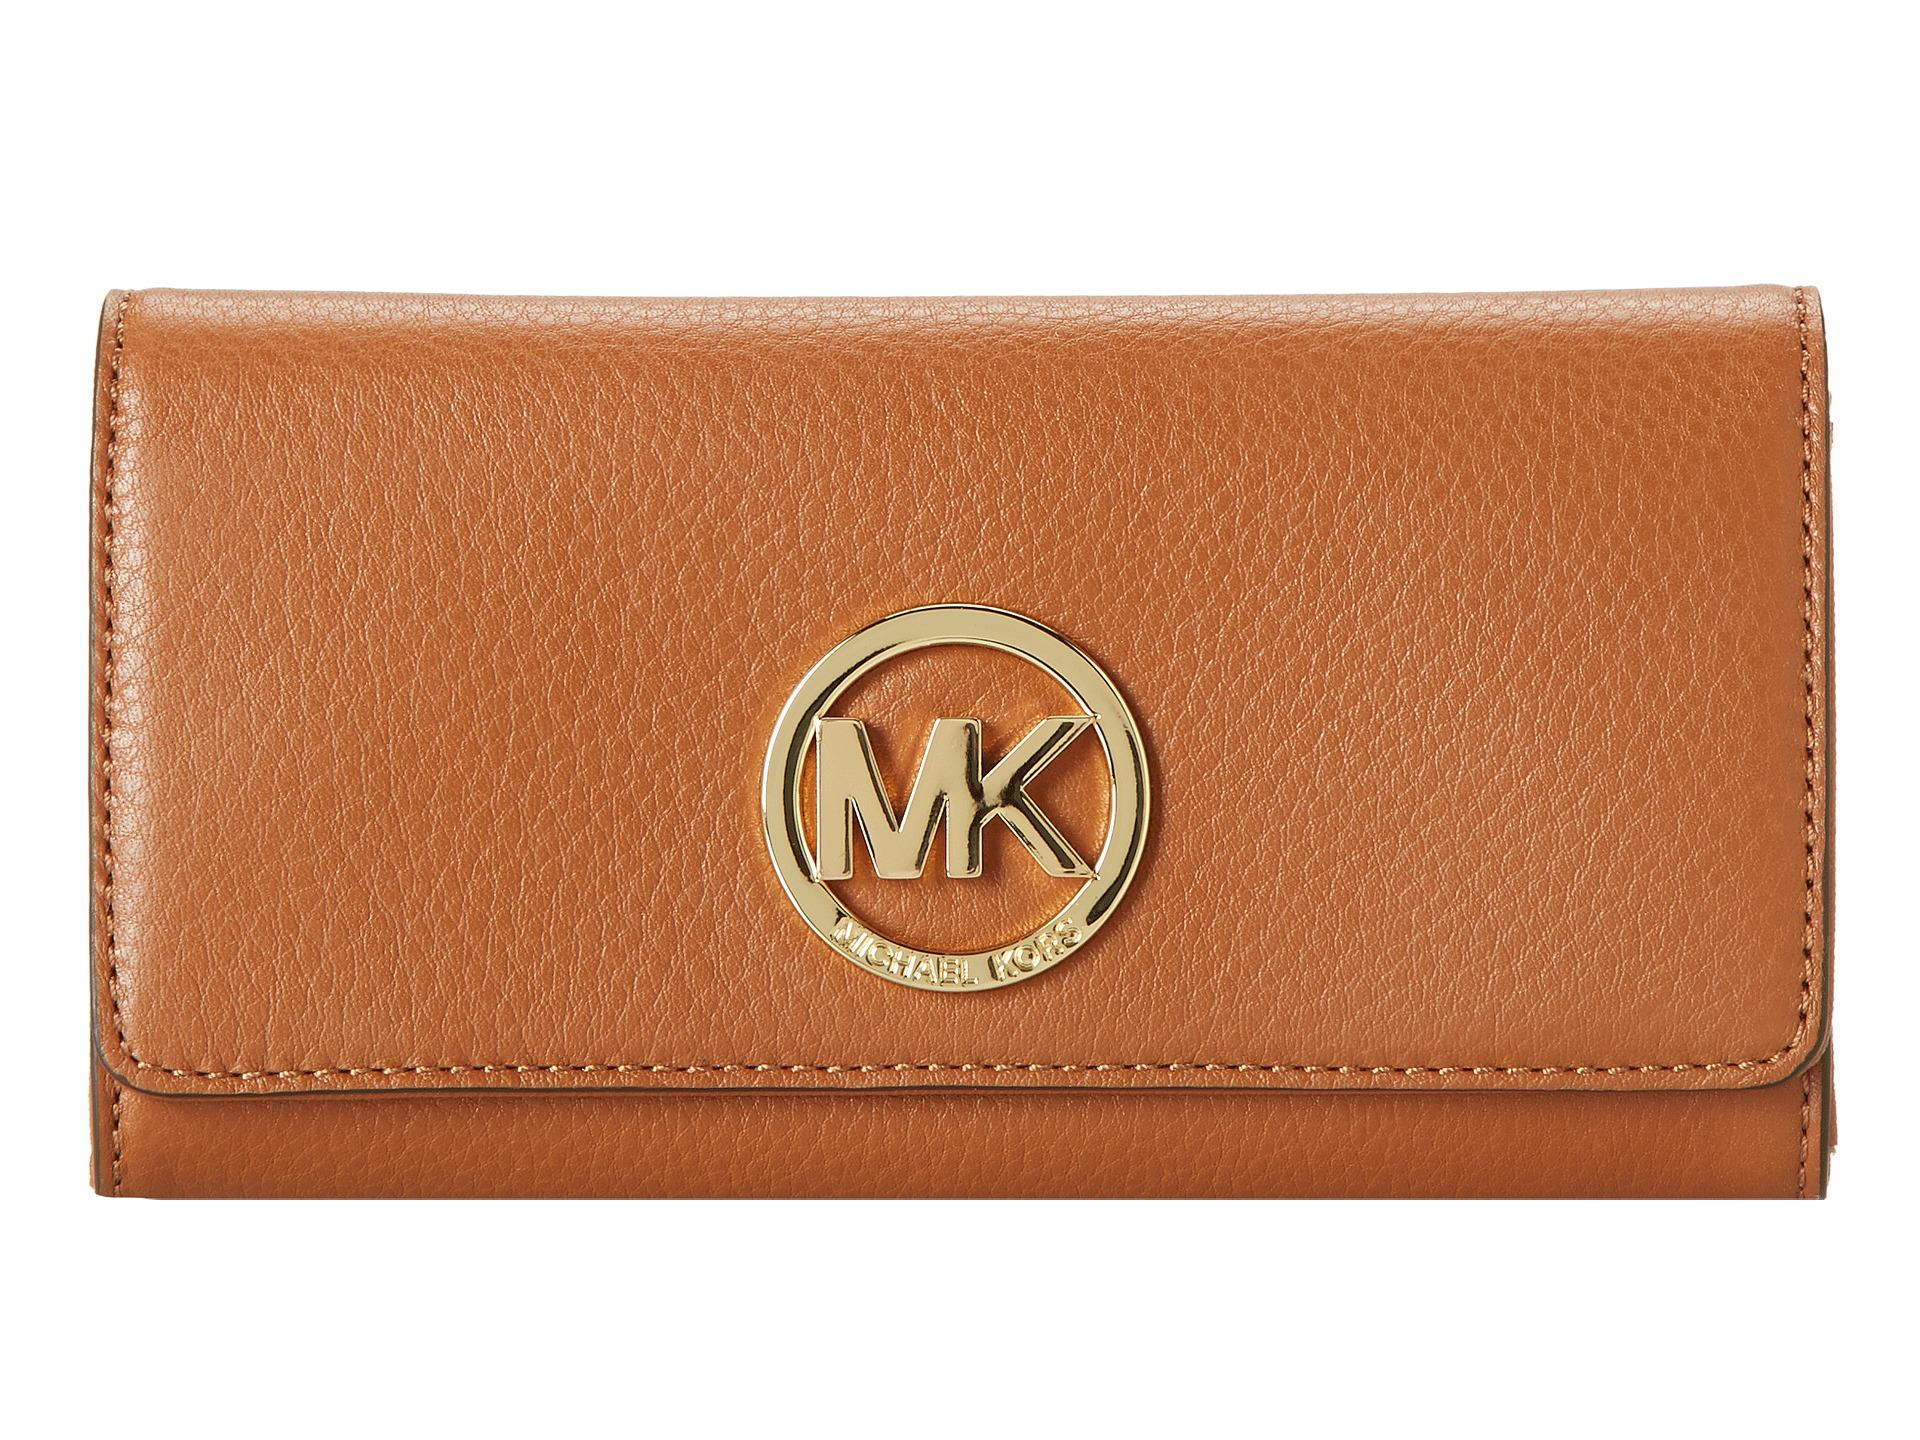 adf7842d3c61e1 Buy fulton wallet michael kors > OFF65% Discounted